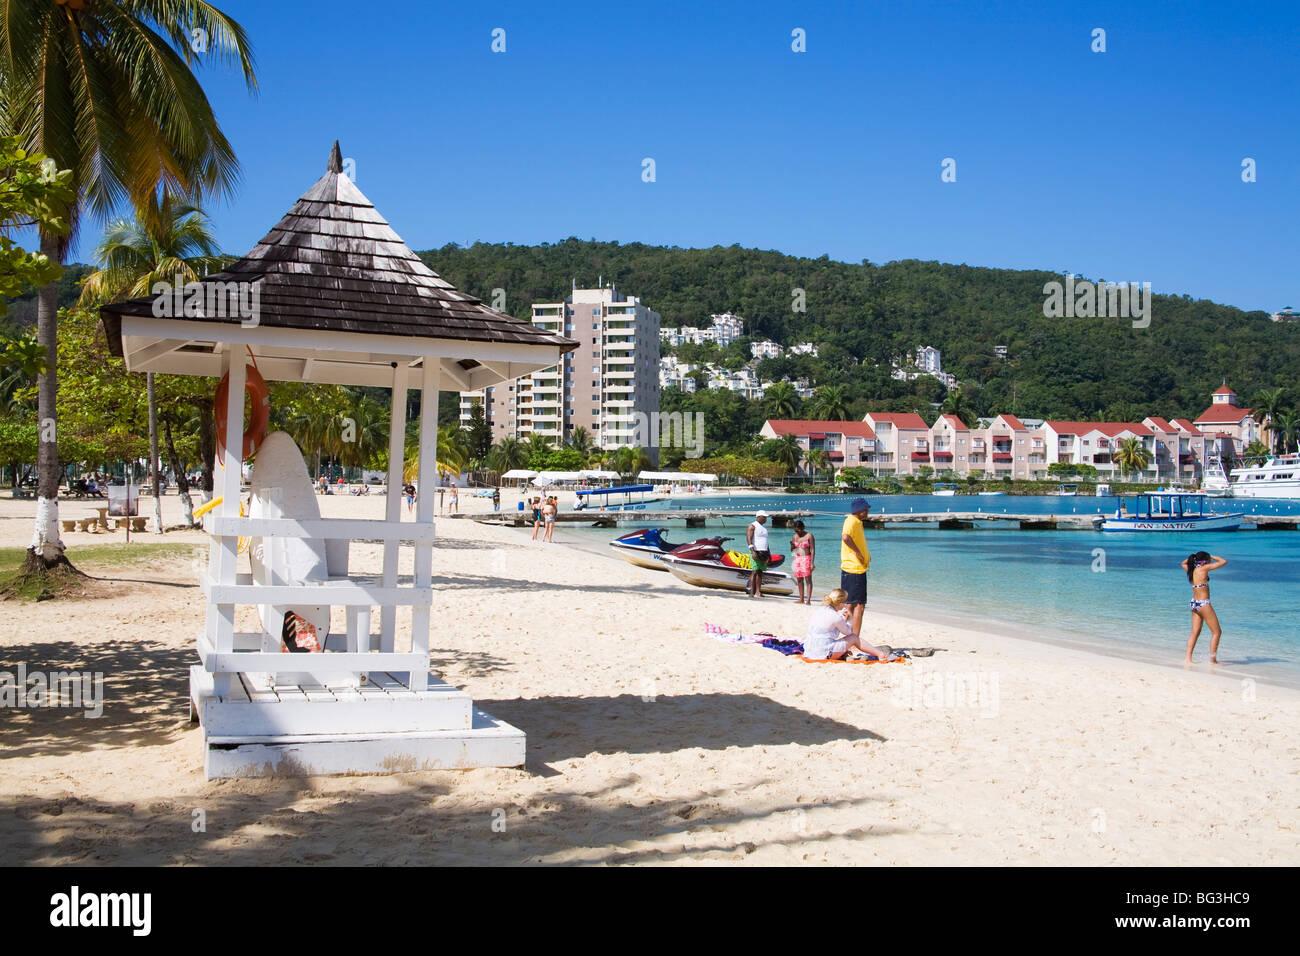 Turtle Beach, Ocho Rios, St. Ann's Parish, Jamaica, West Indies, Caribbean, Central America - Stock Image